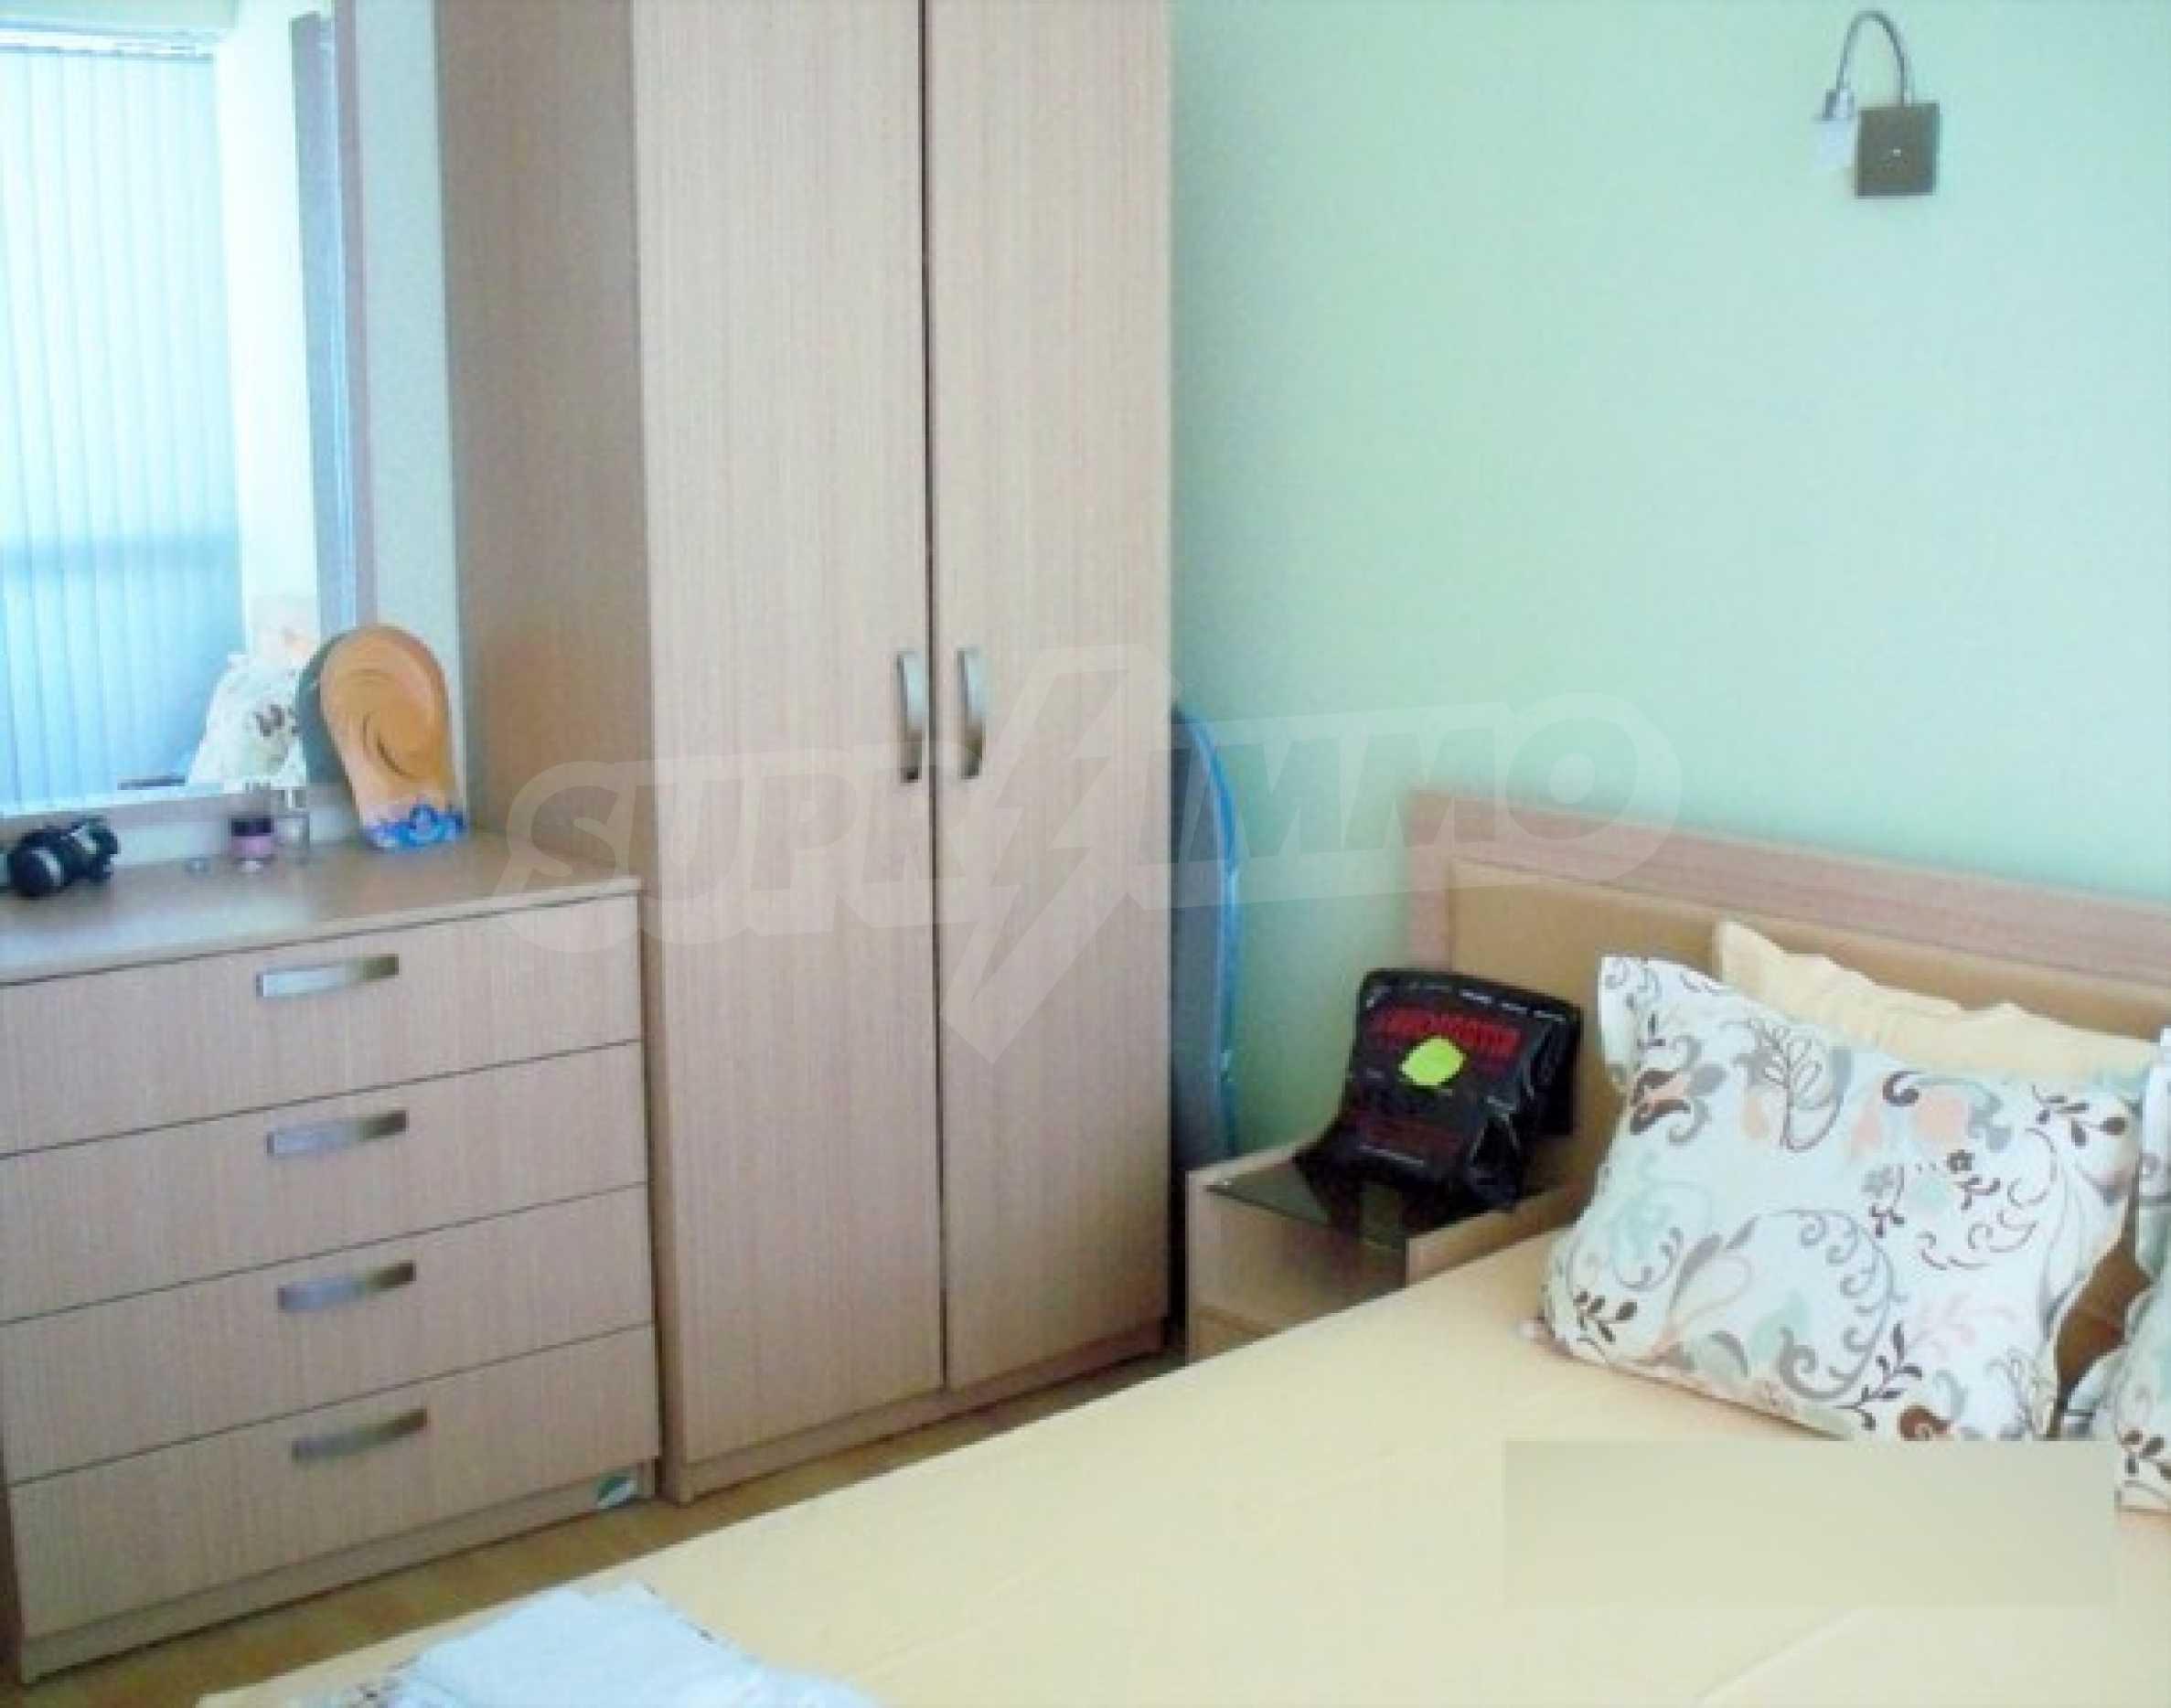 Тристаен апартамент за продажба в Поморие 15